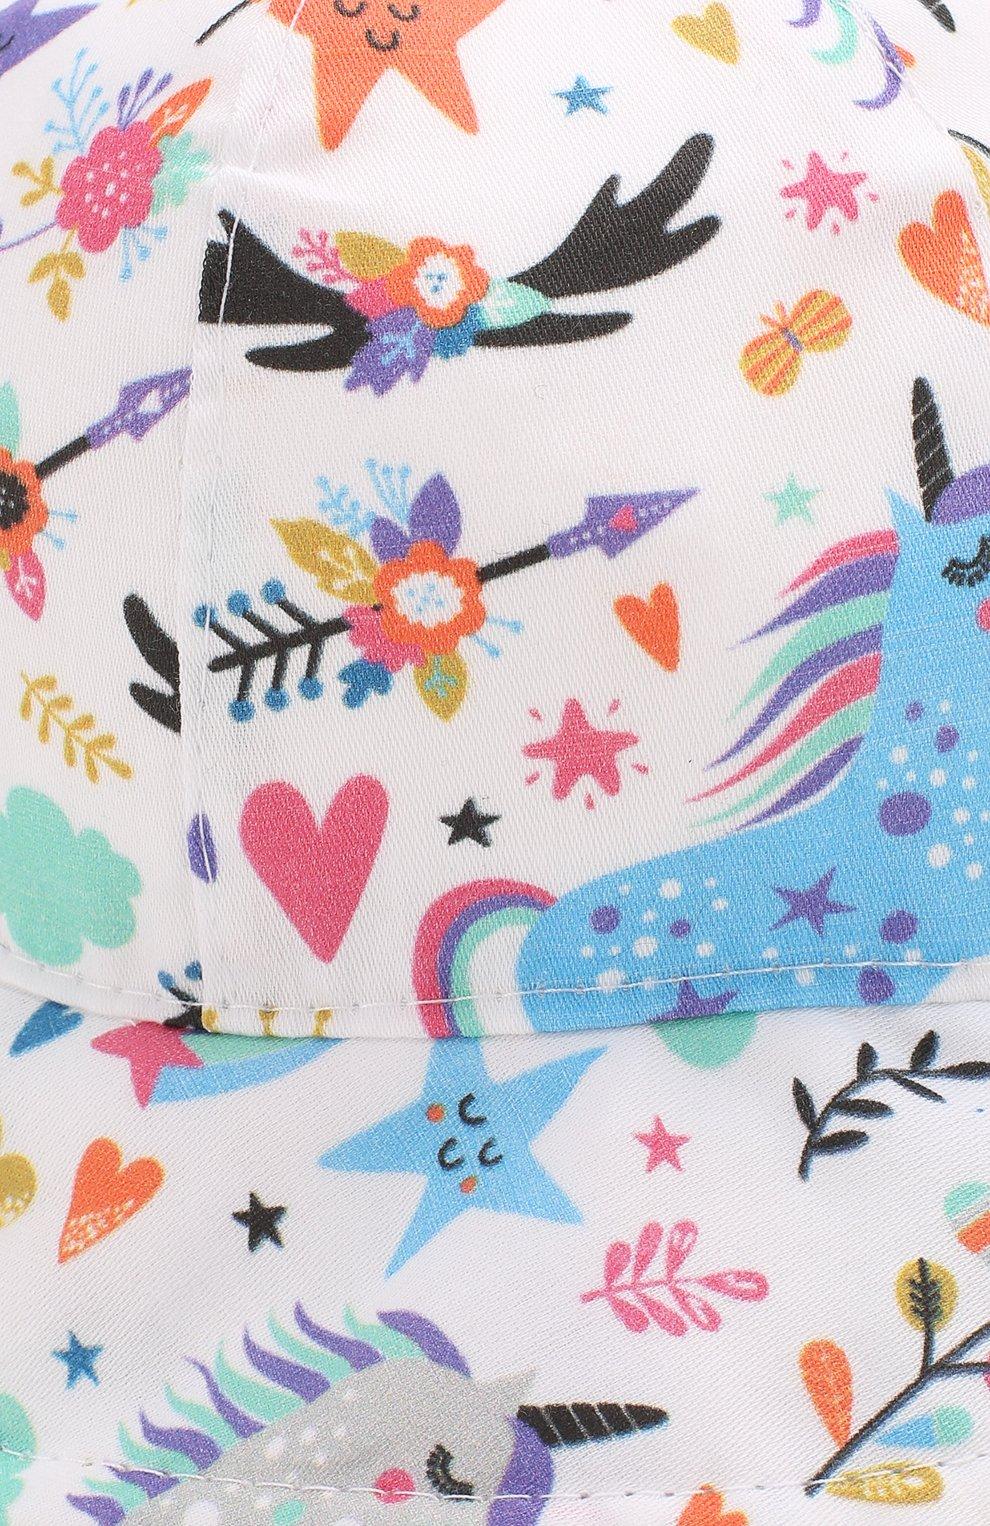 Детская панама CATYA разноцветного цвета, арт. 014060   Фото 3